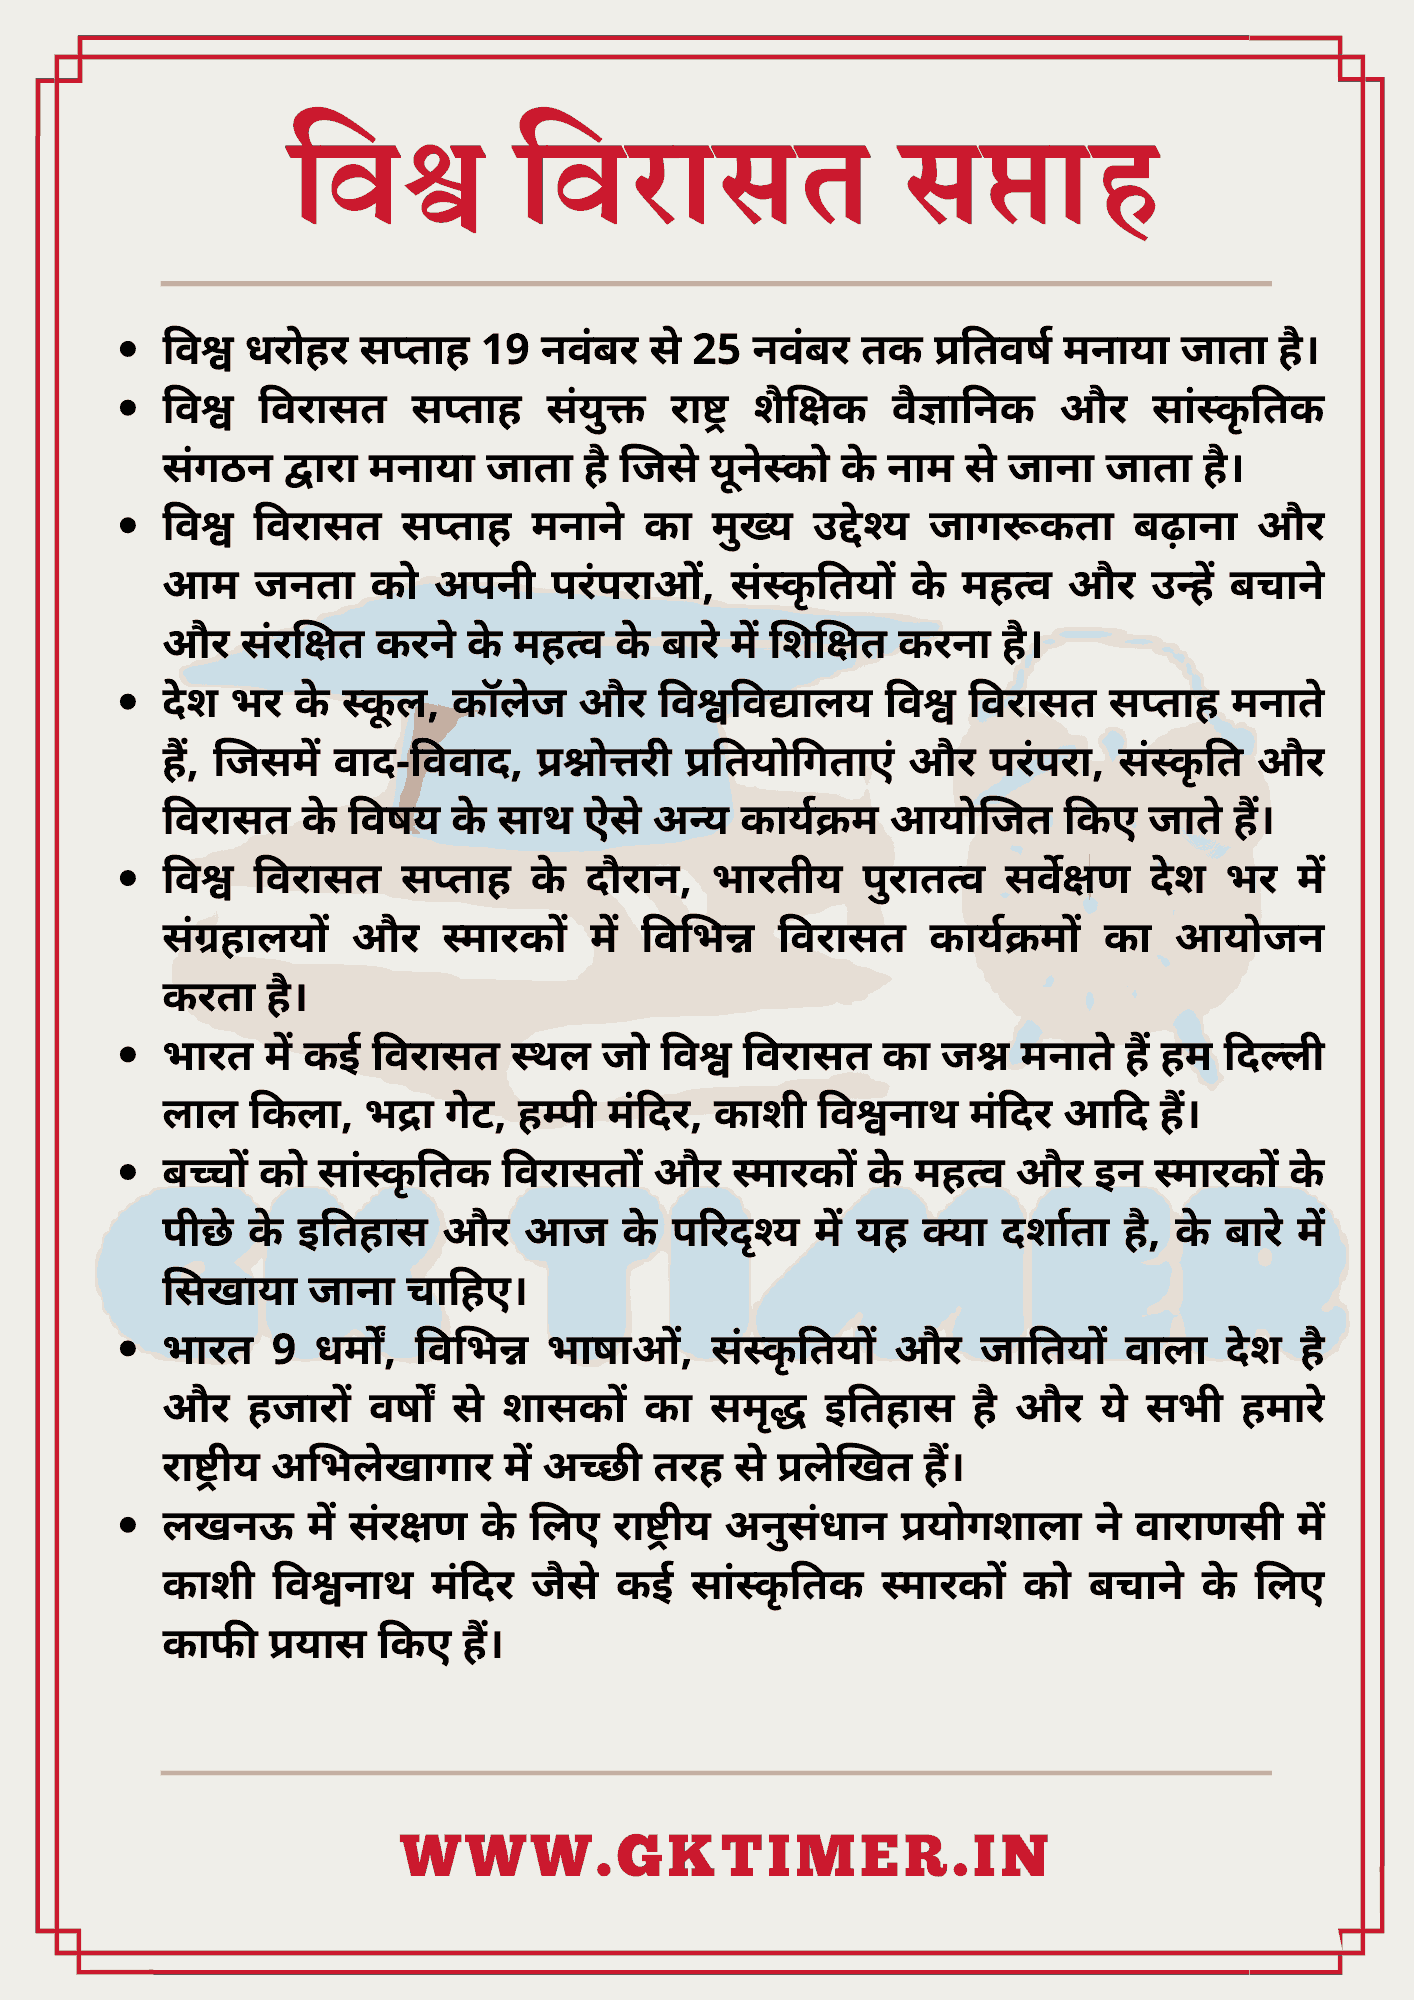 विश्व विरासत सप्ताह पर निबंध | Essay on World Heritage Week in Hindi | 10 Lines on World Heritage Week in Hindi